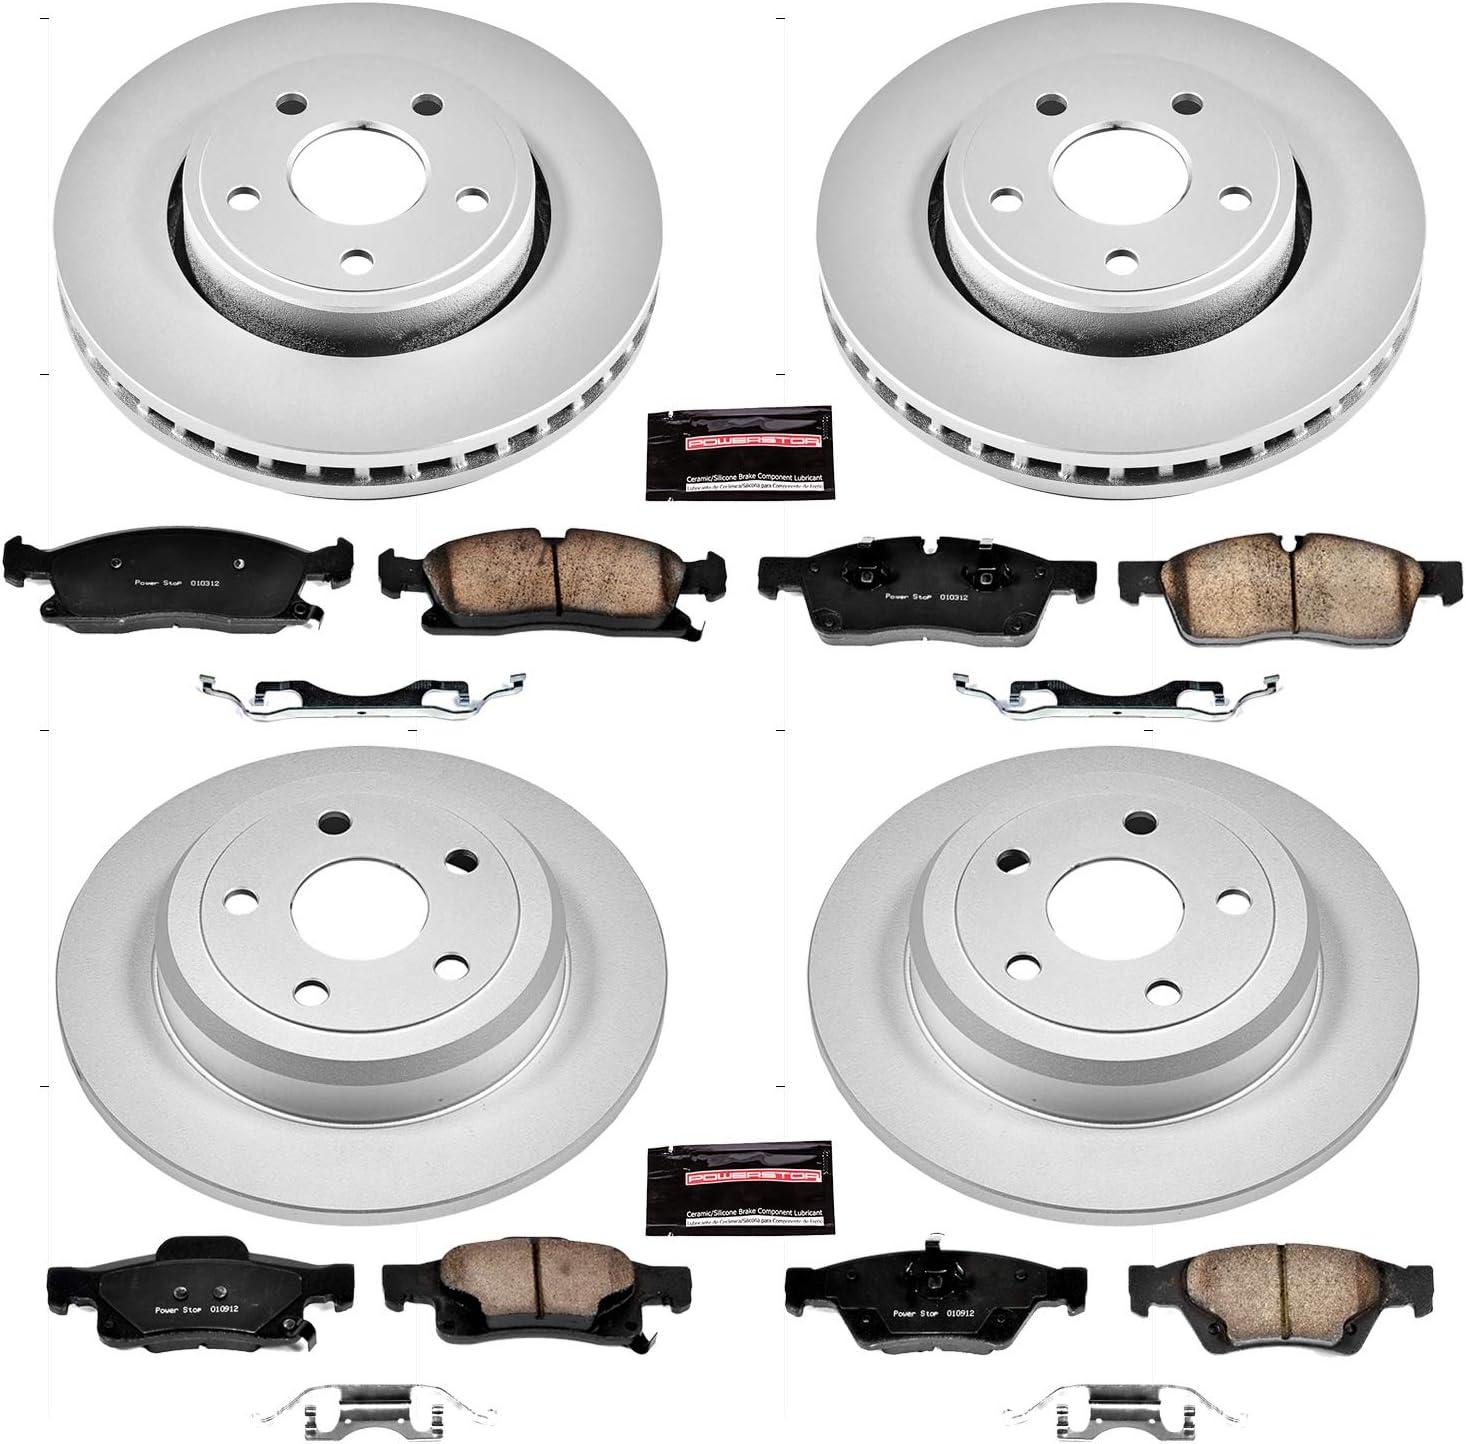 Power Stop CRK1921,Z17 Coated Rotor Front and Rear Brake Kit-Coated Brake Rotors /& Ceramic Brake Pads